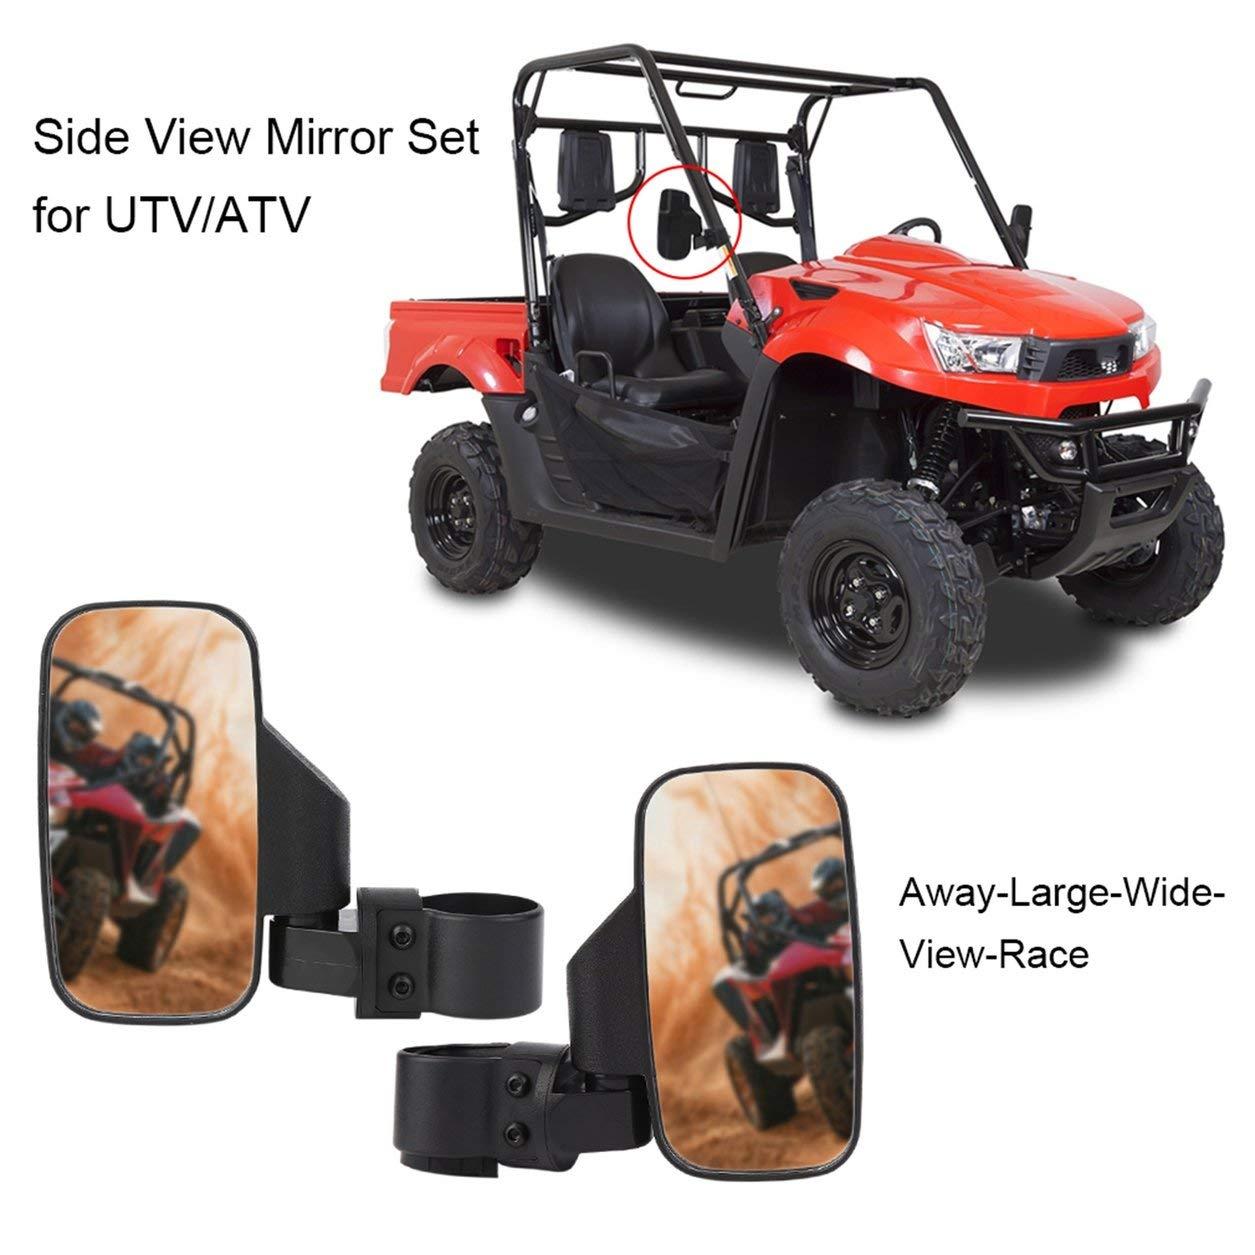 Side View Mirrors Set High Impact Break-Away Large Wide View For UTV ATV GA